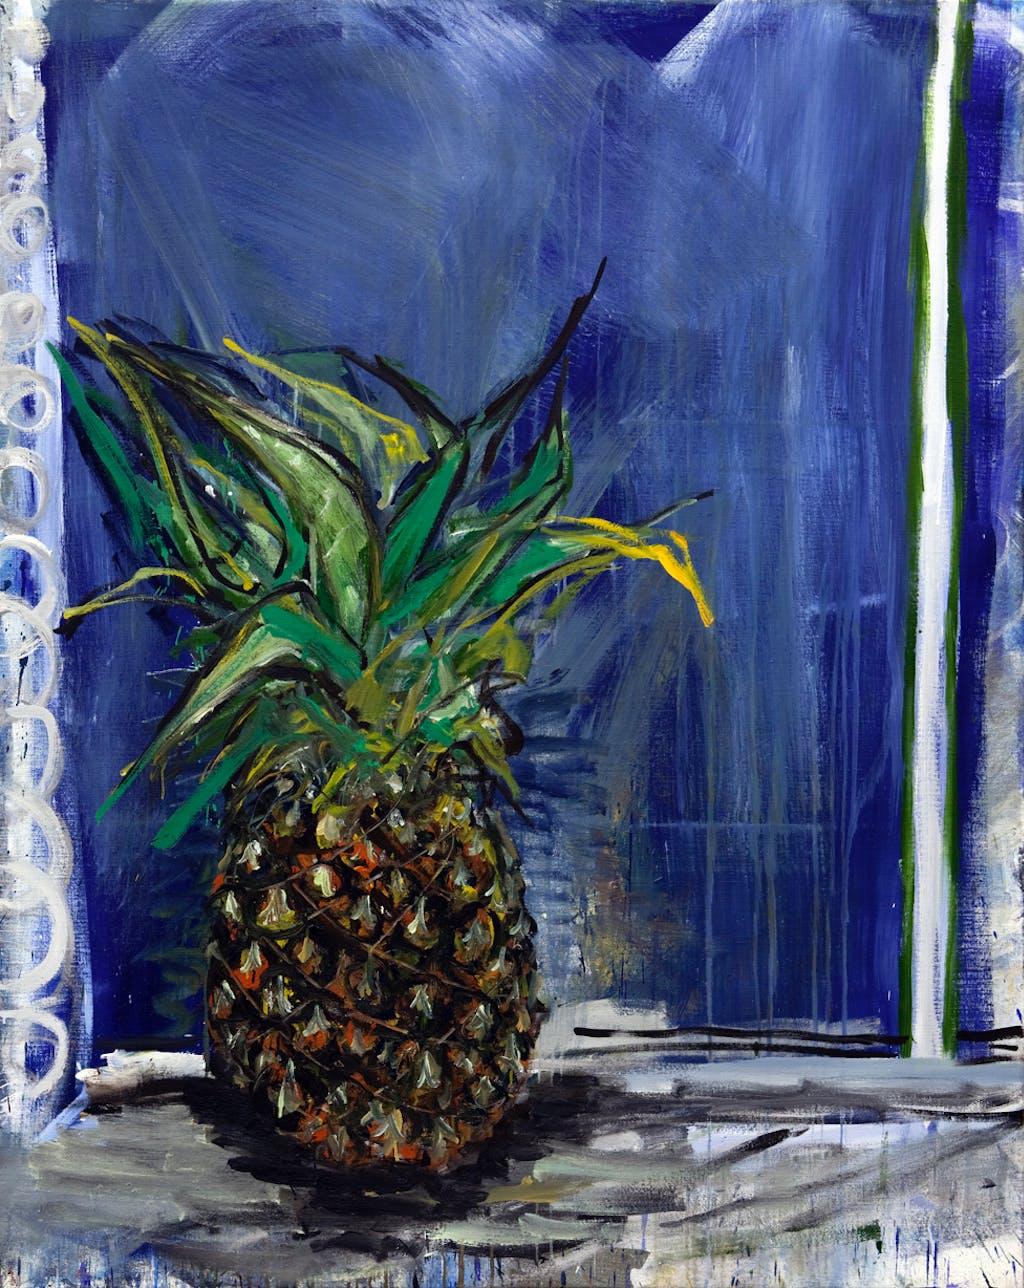 Windows and ananas 4 - © kamel mennour